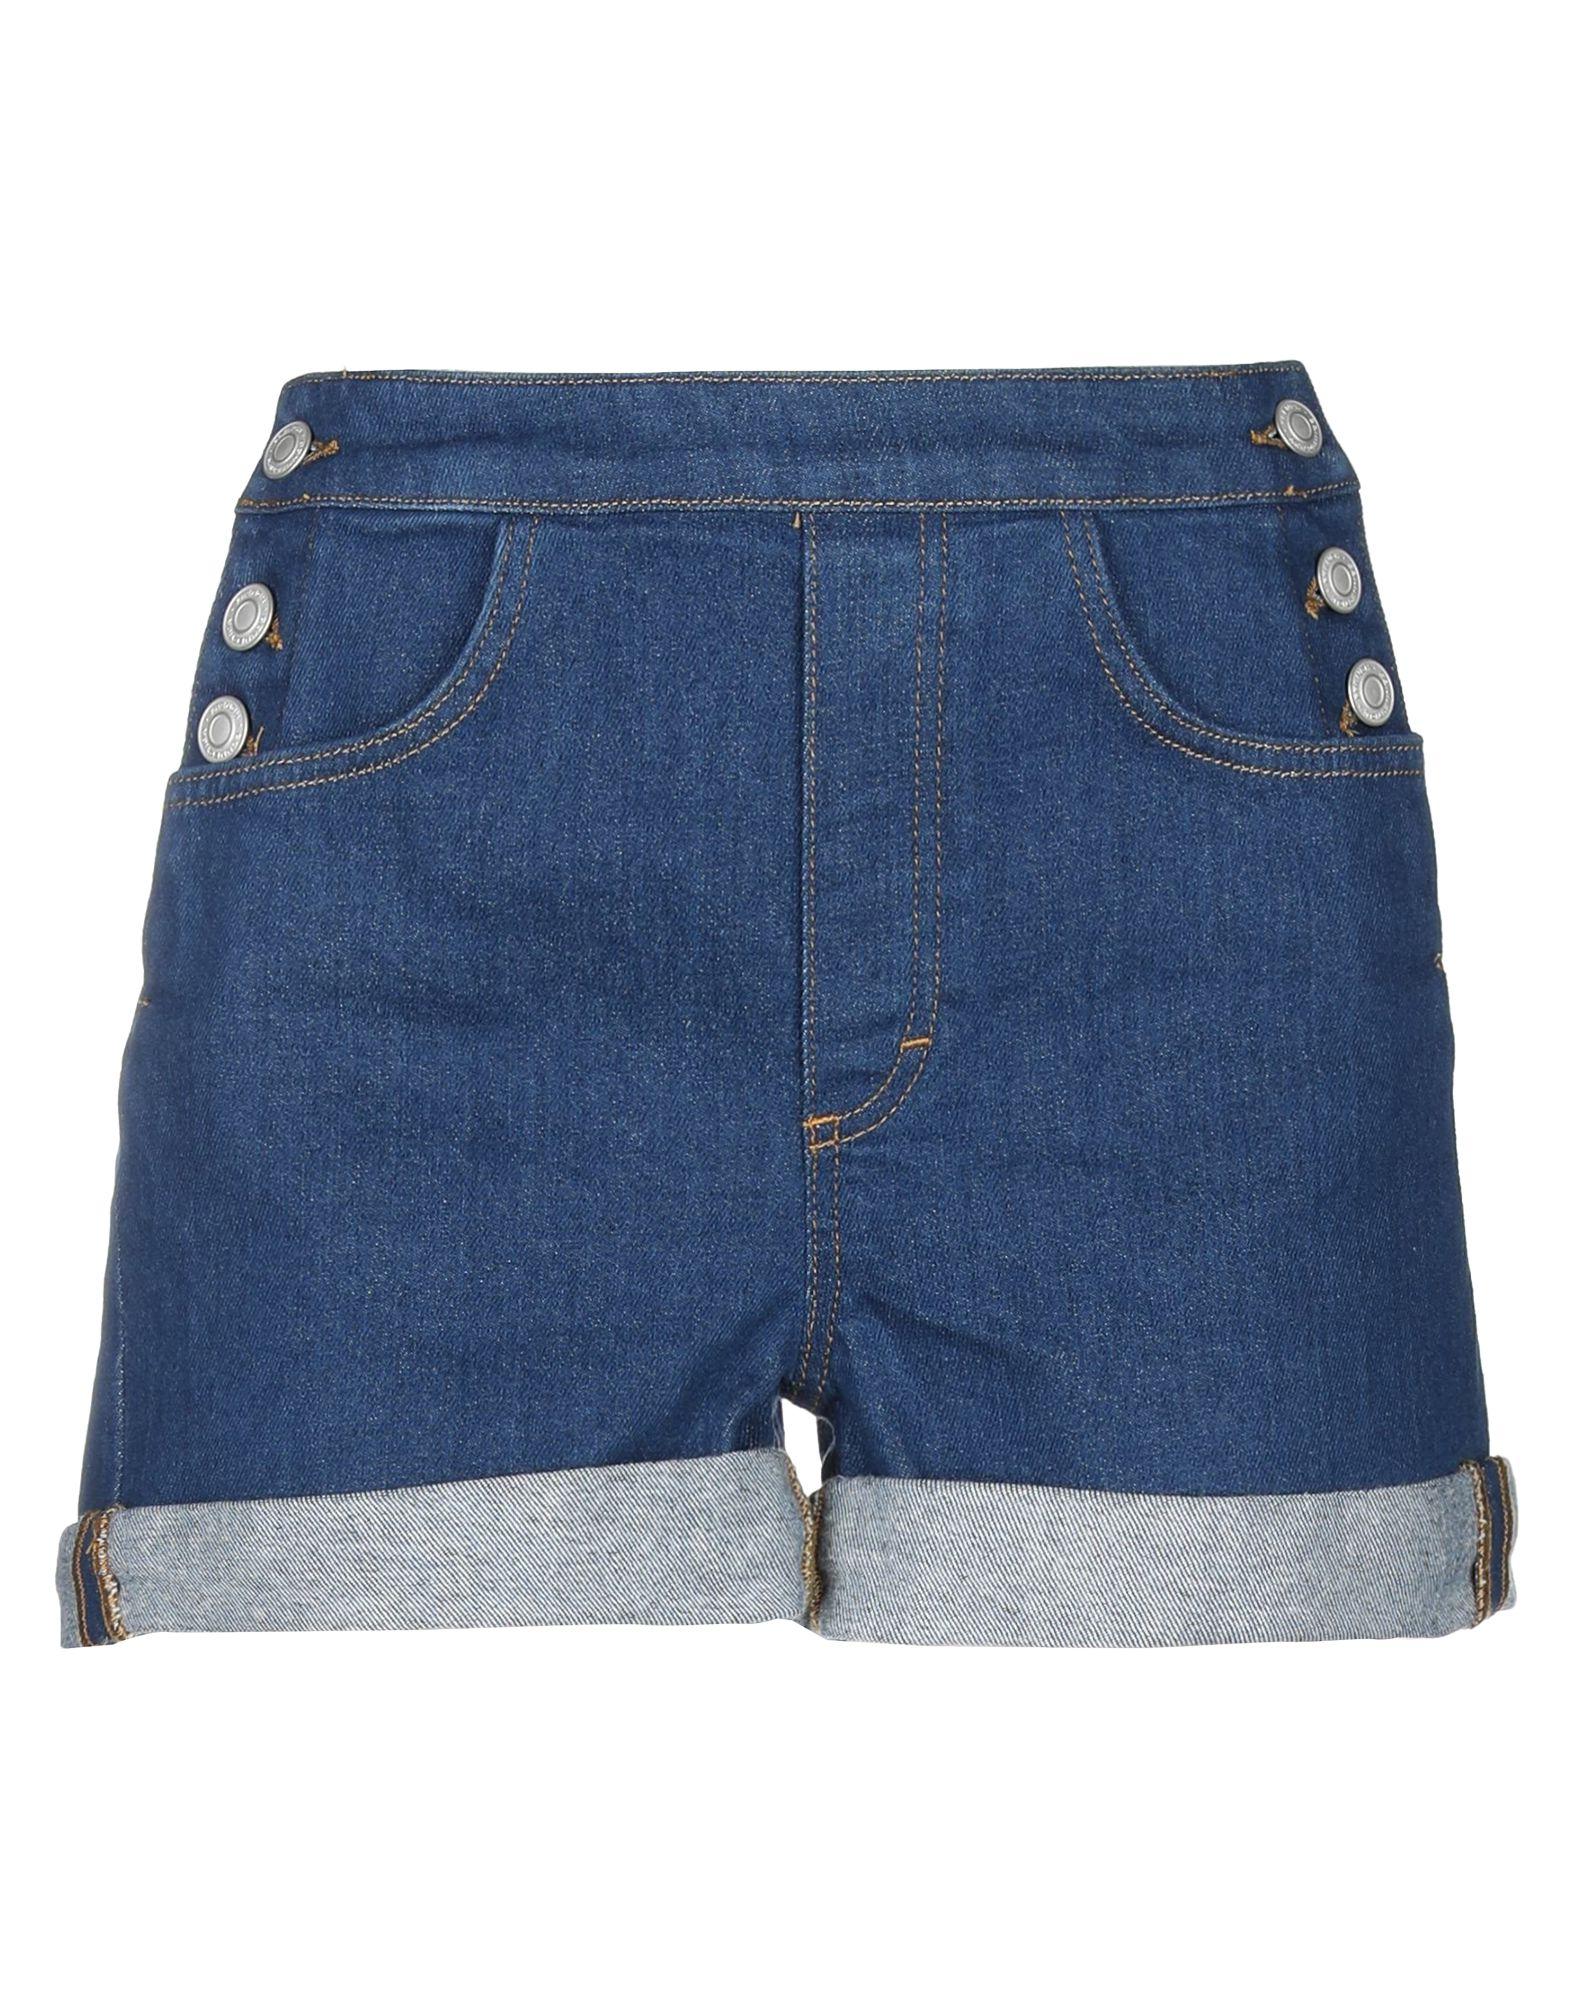 FRENCH CONNECTION Джинсовые шорты french connection джинсовые брюки